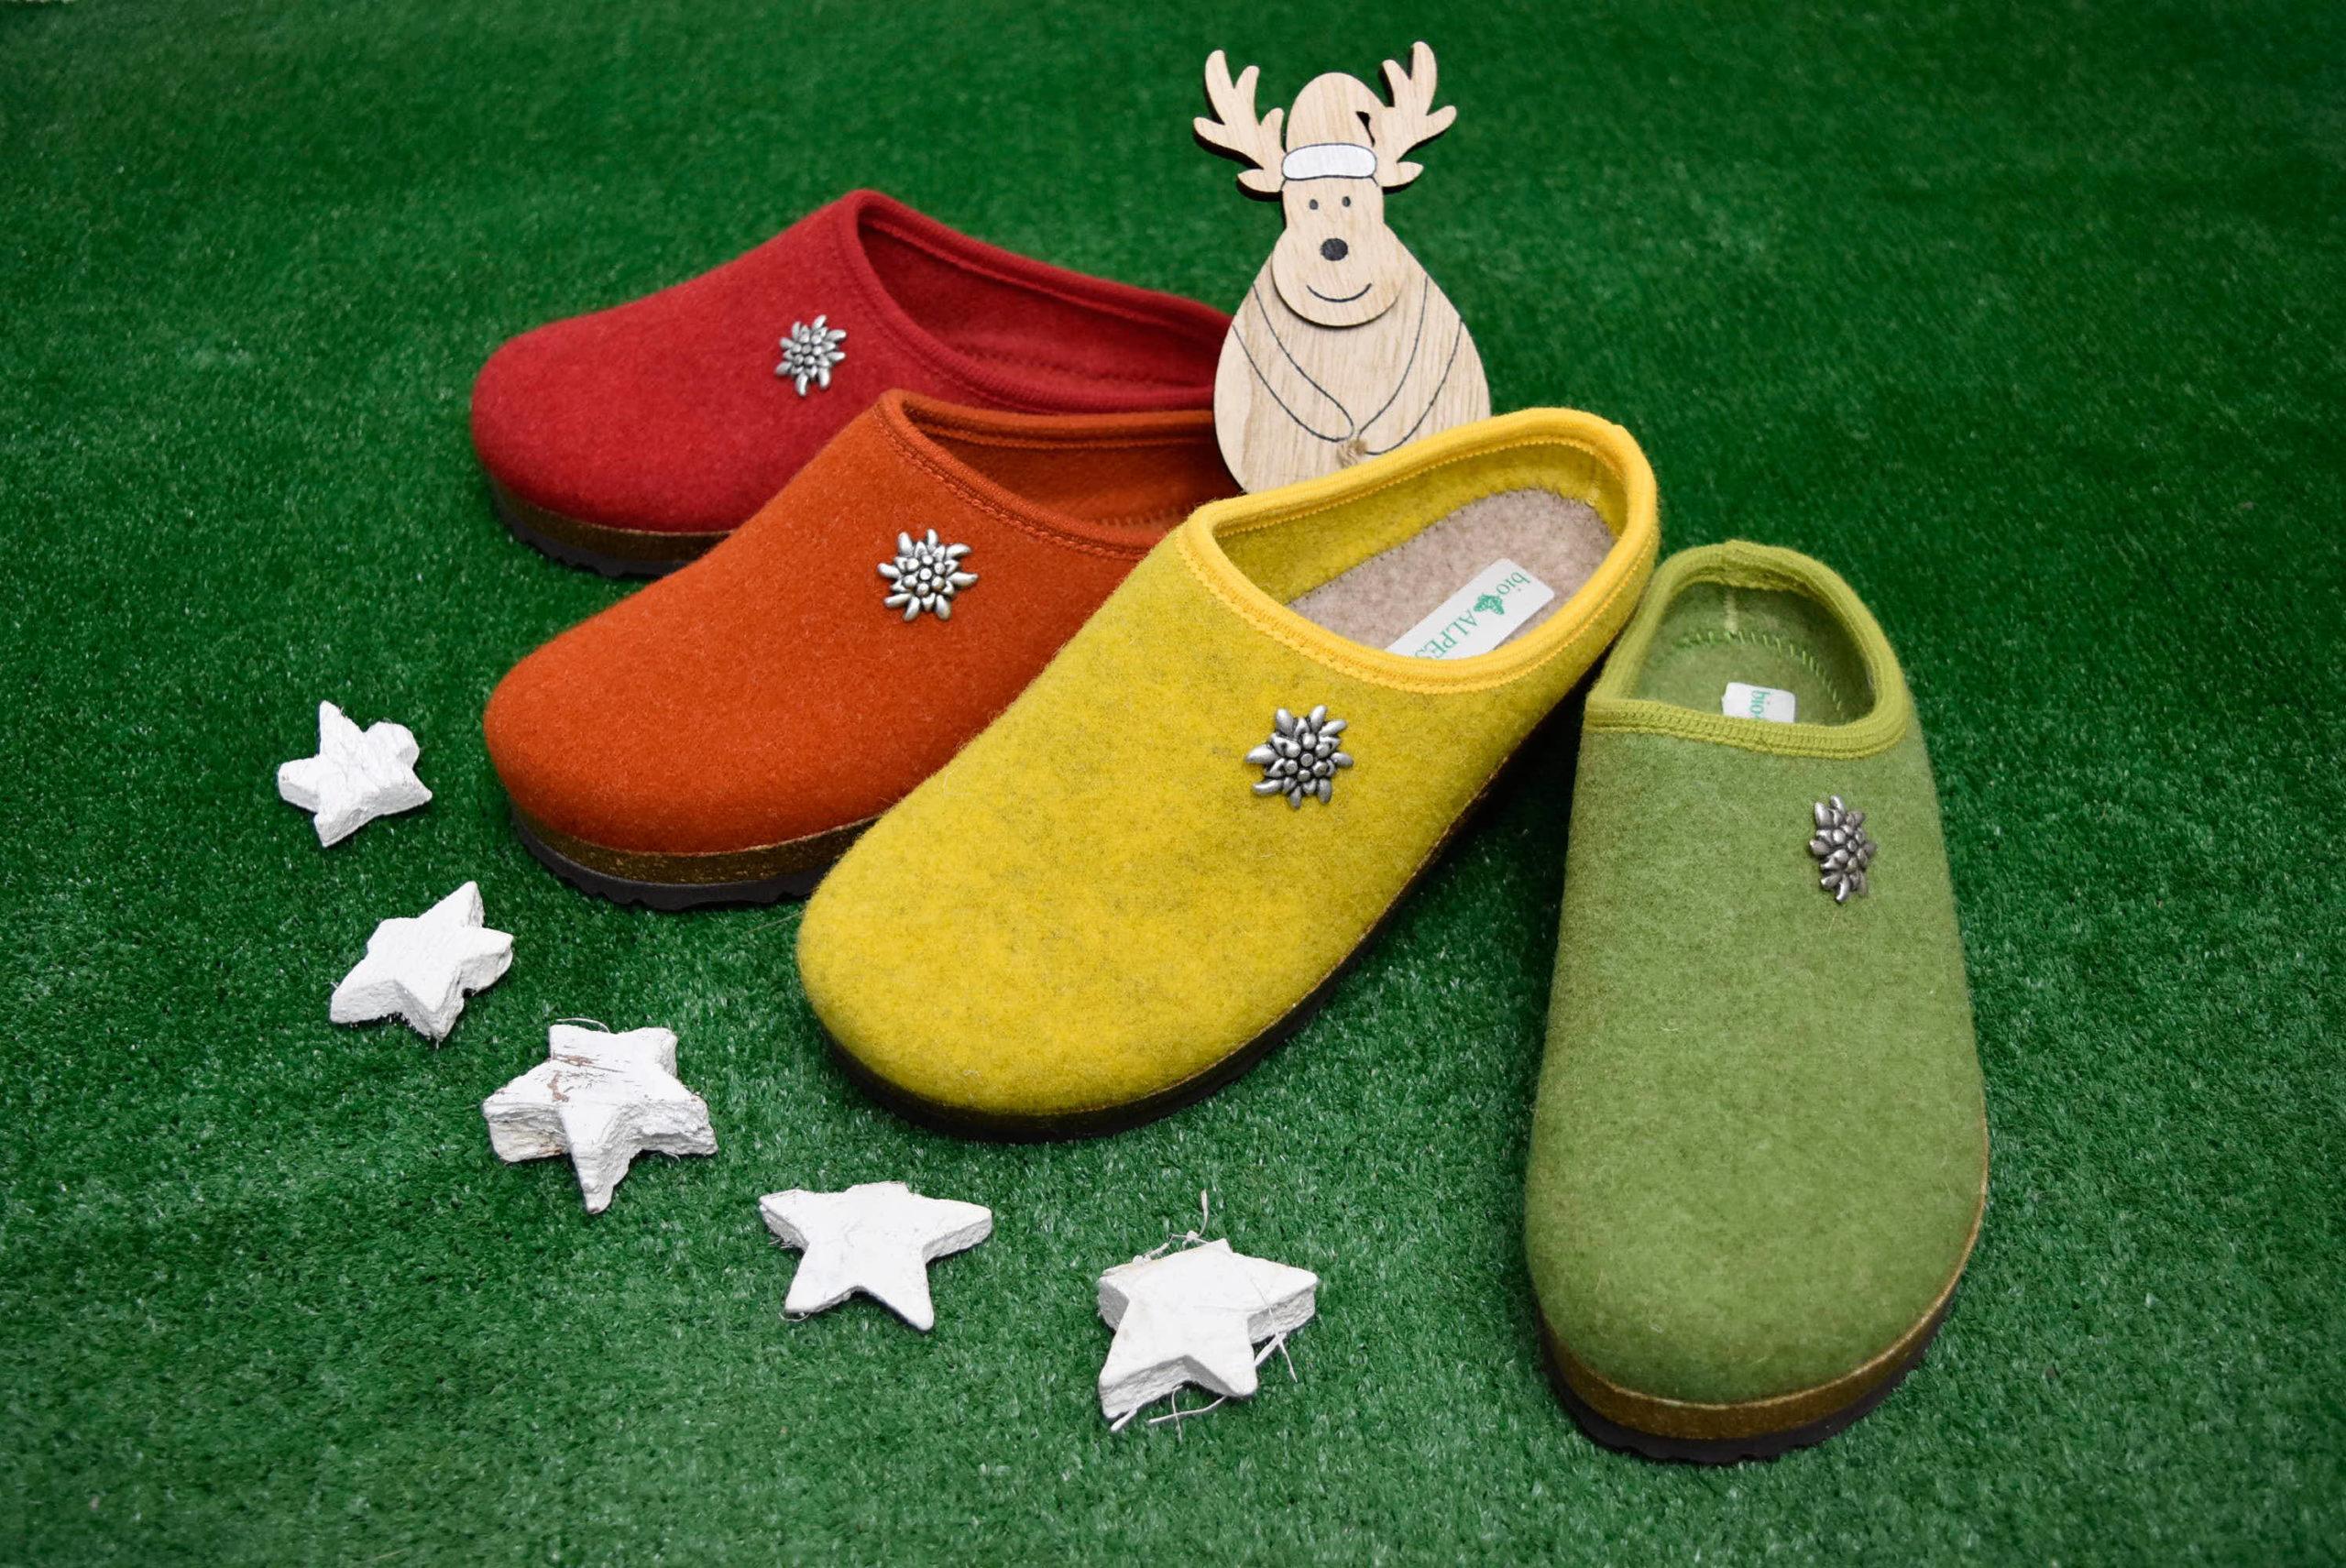 bio alpes 977 rosso ribes giallo verde arancione ciabatte natalizie da donna pantofole tirolesi calzature tradizionali altoatesine feltro lana cotta idea regalo